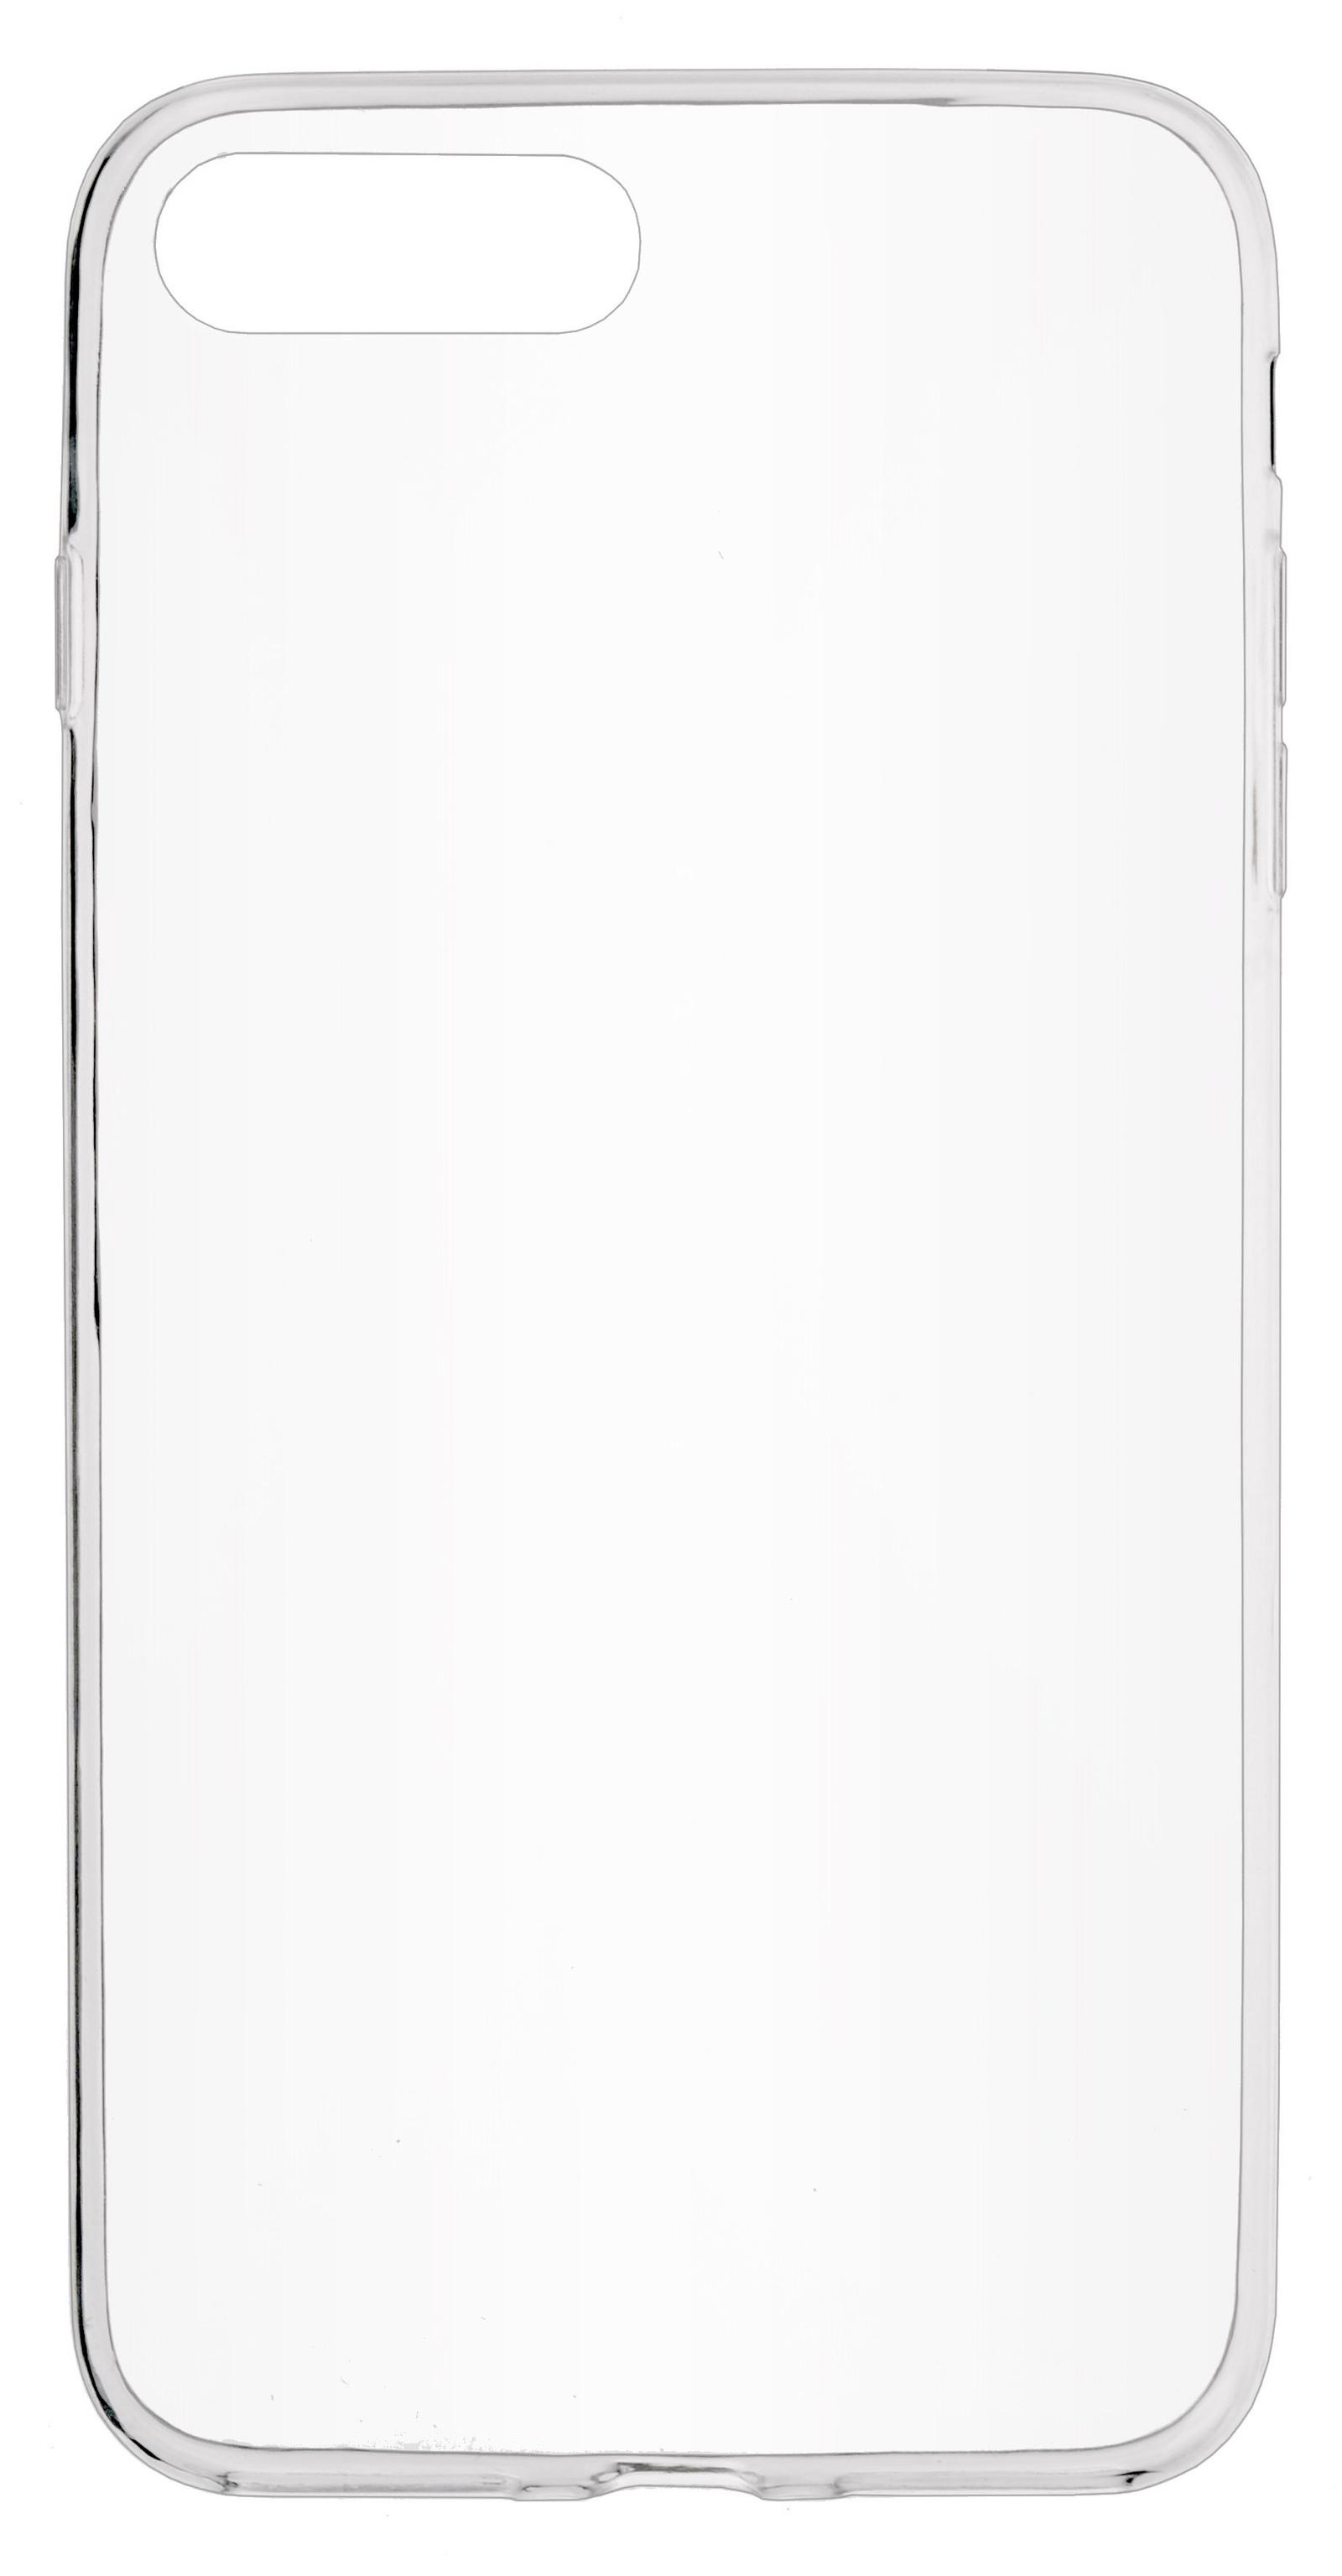 Чехол для сотового телефона skinBOX Slim Silicone, 4660041408041, прозрачный цена и фото